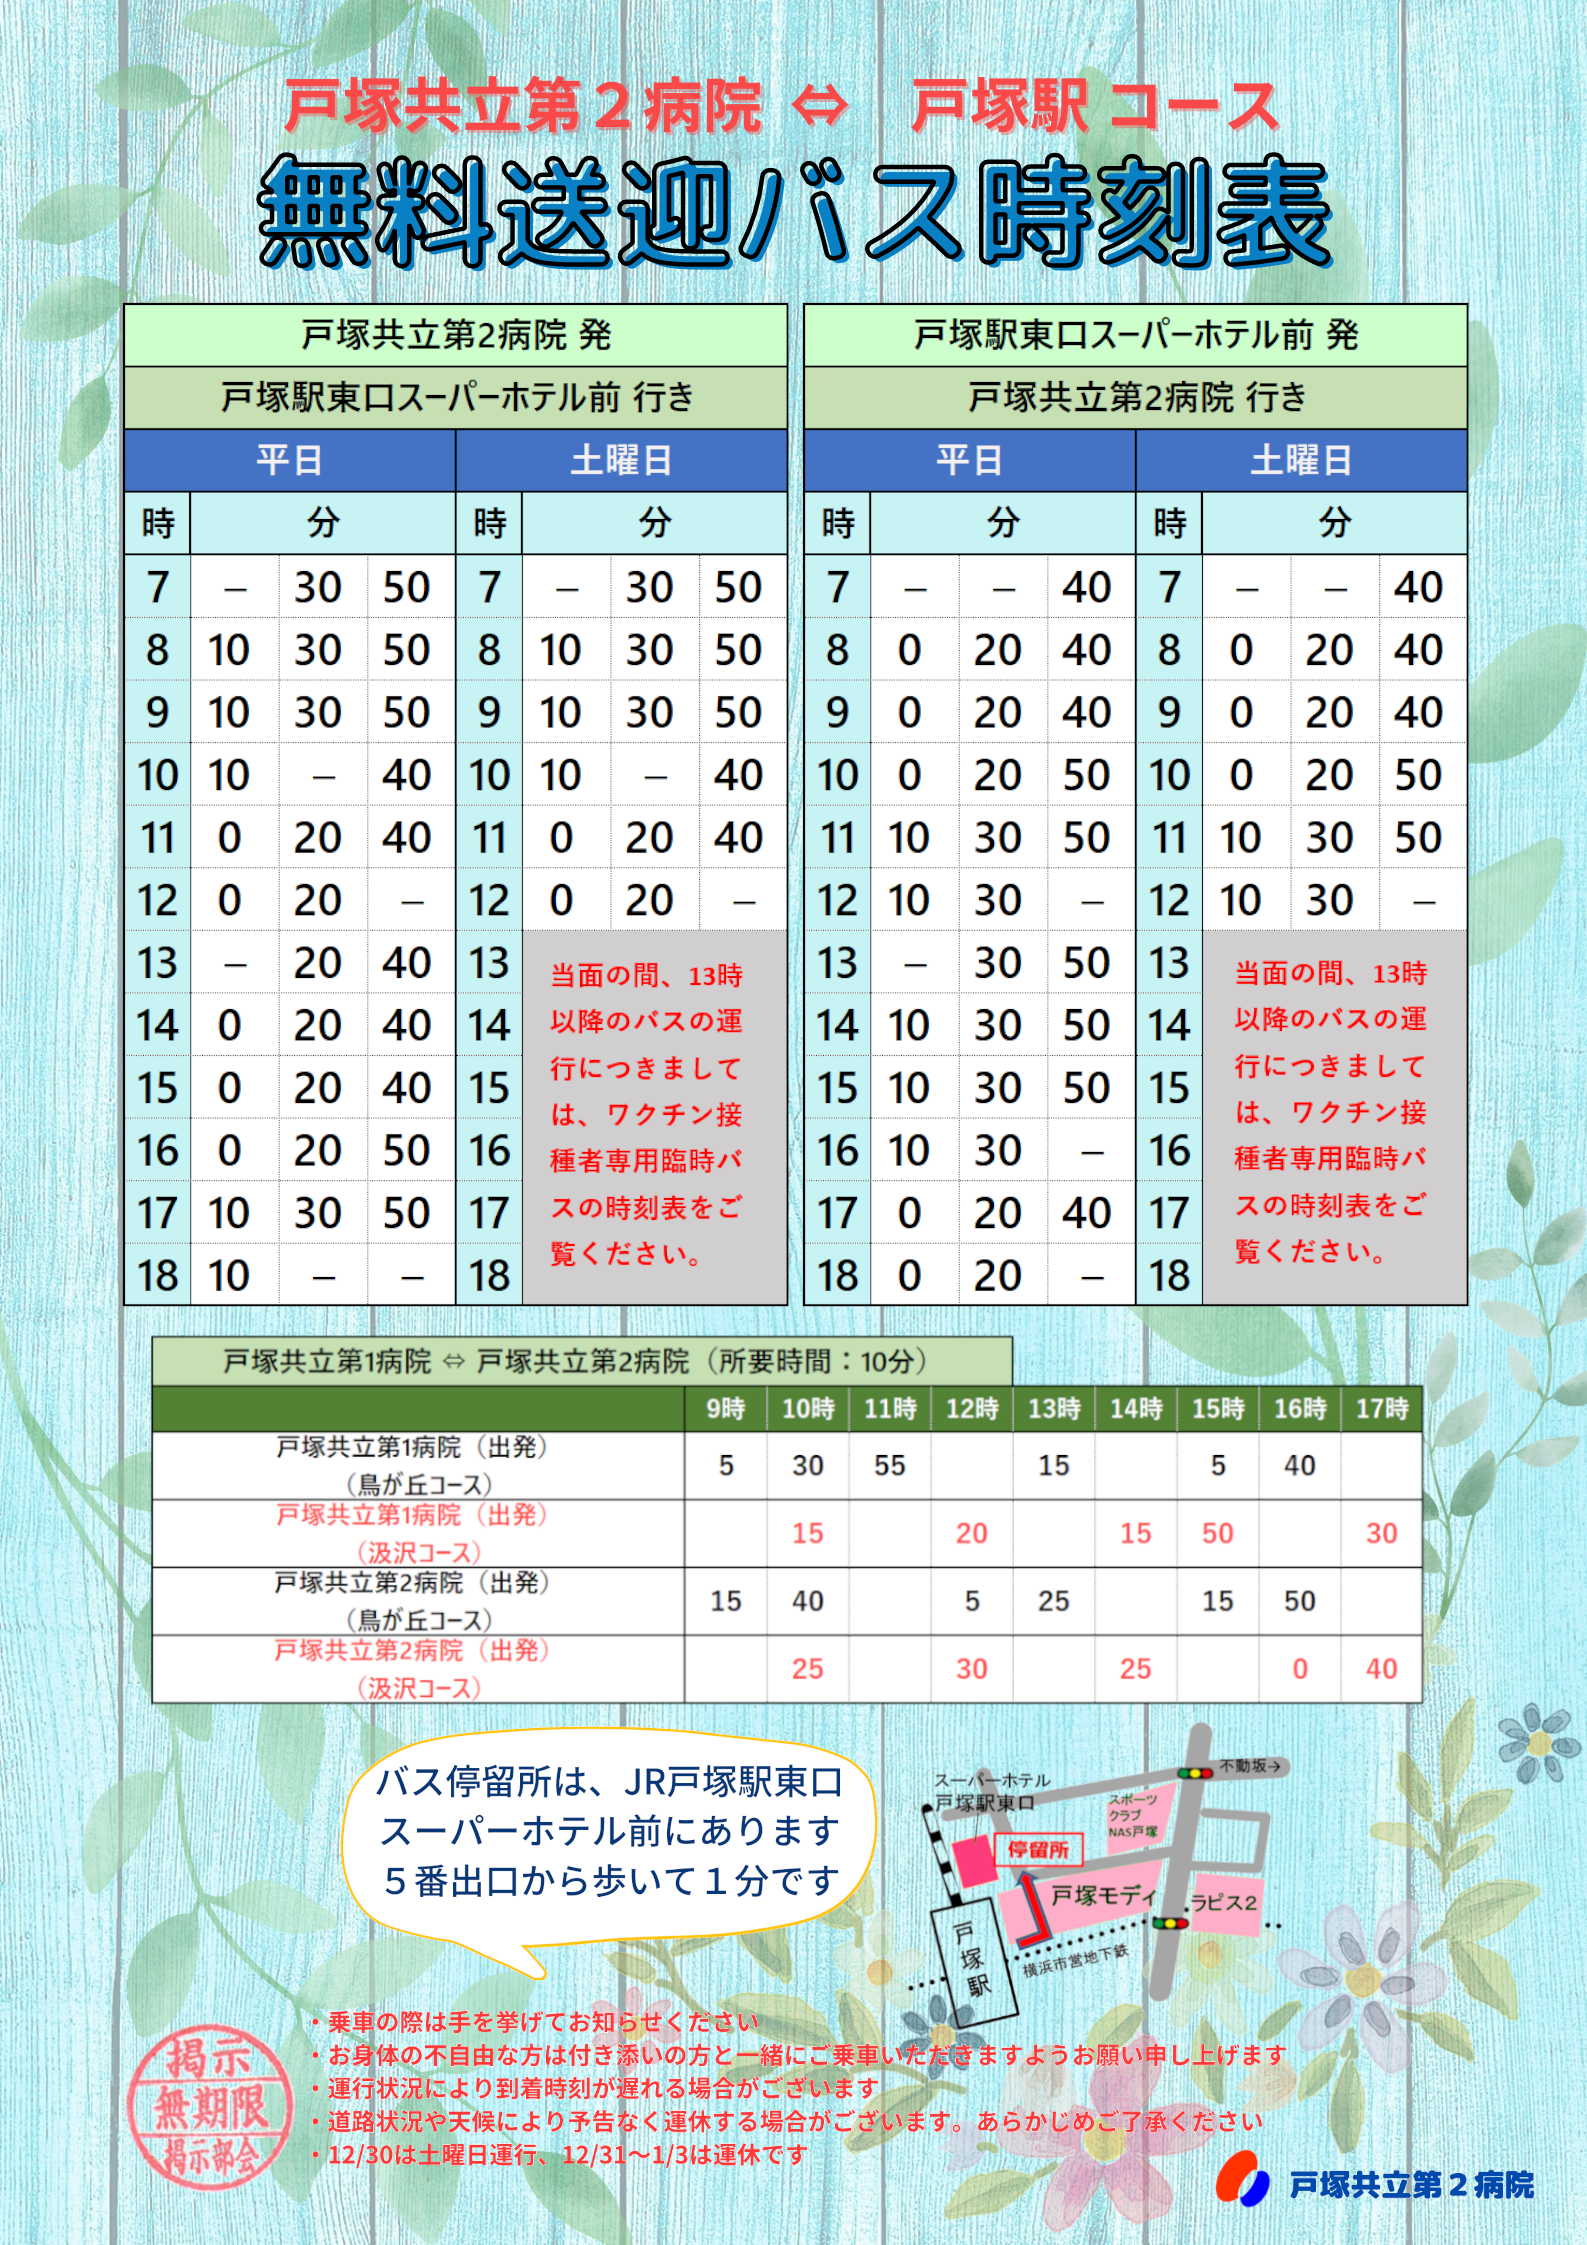 無料送迎バス時刻表(通常時)